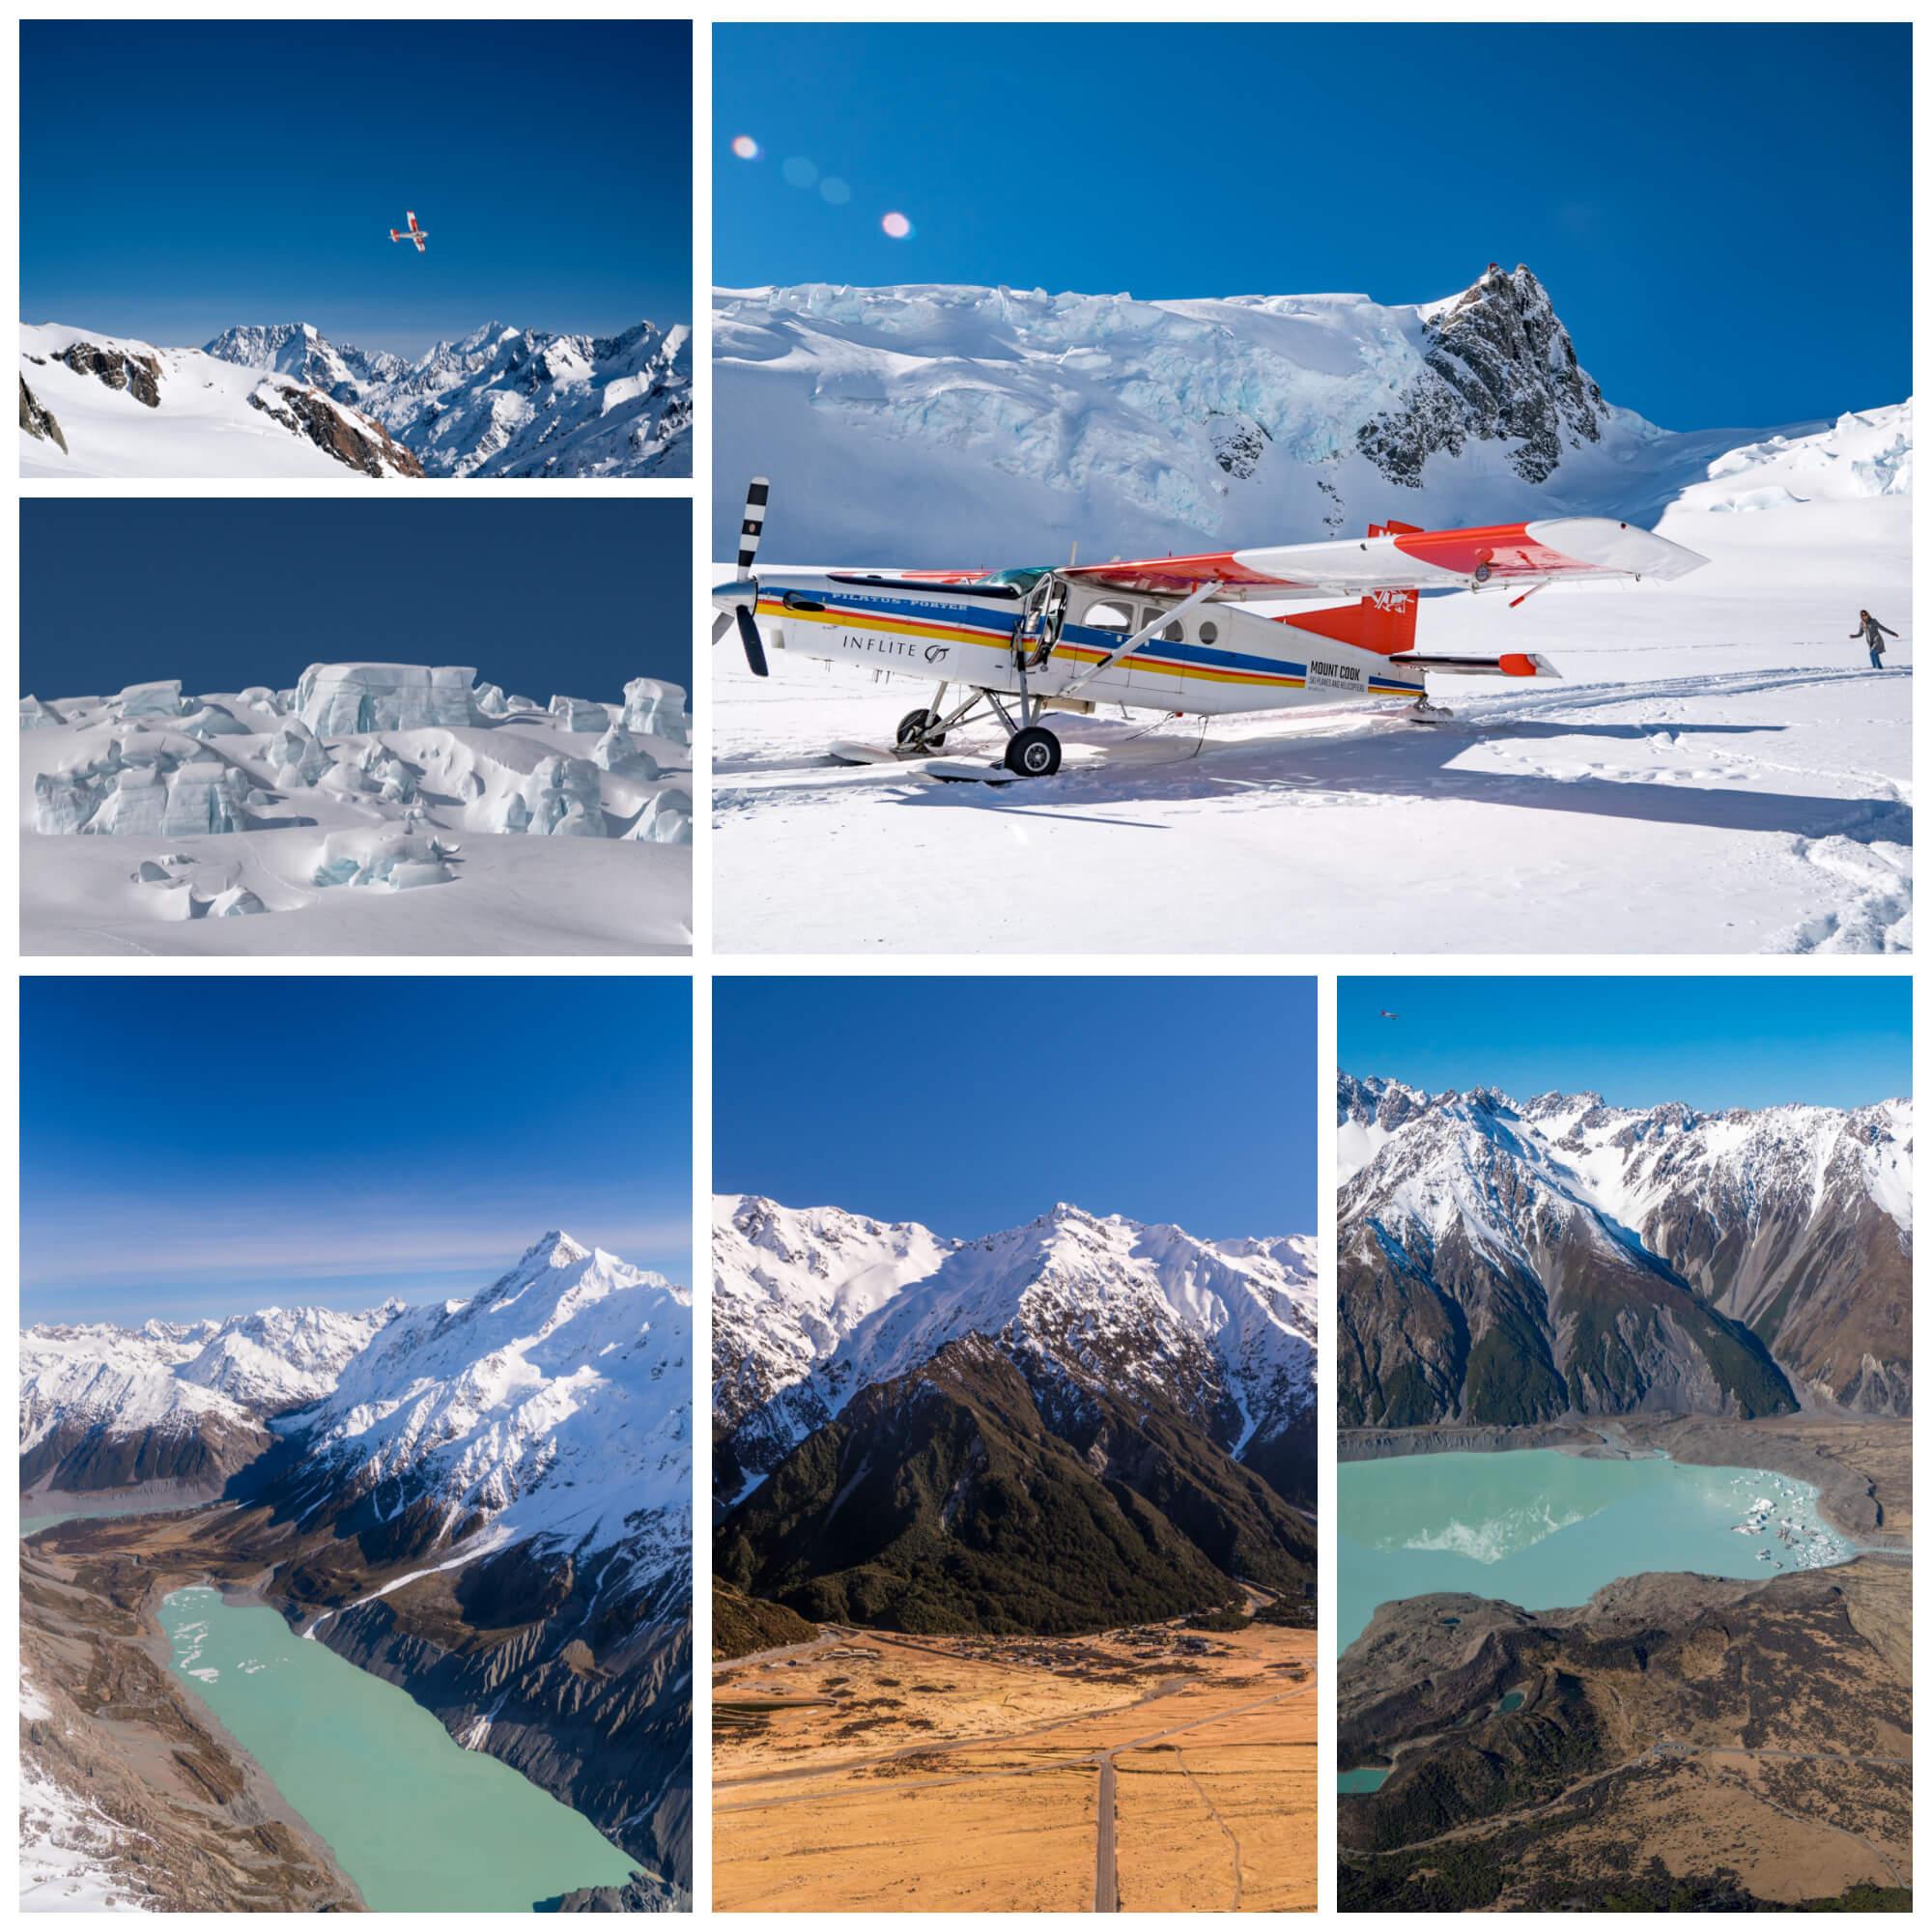 Mt Cook Skiplanes Tasman Glacier Landing